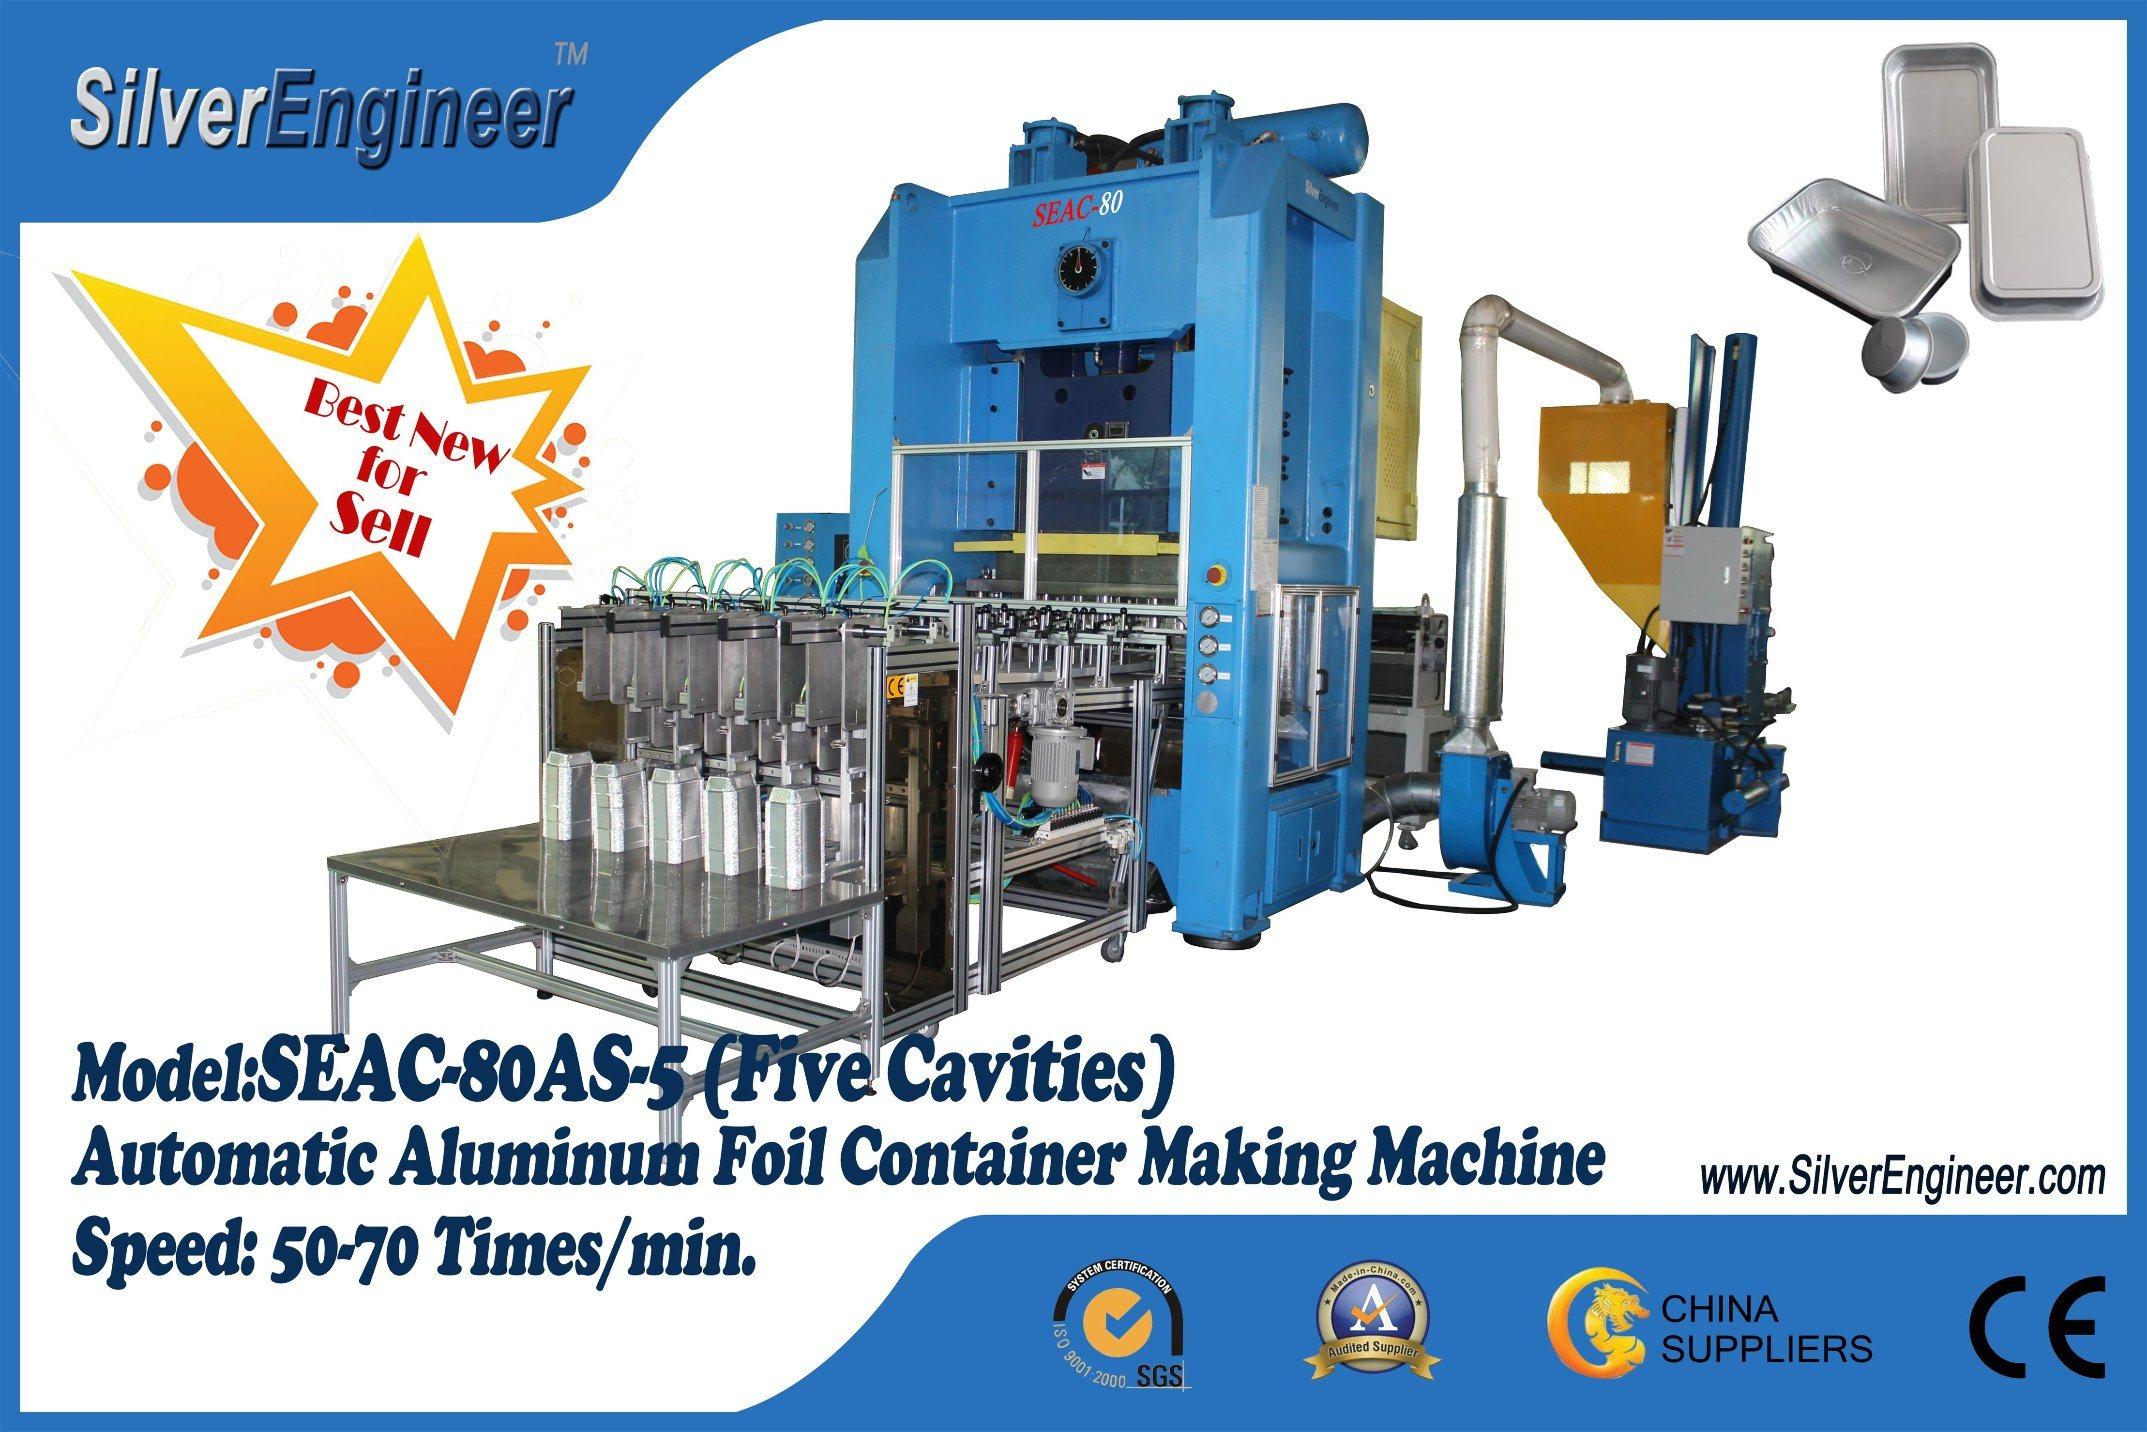 Real Automatic Aluminum Foil Container Production Line